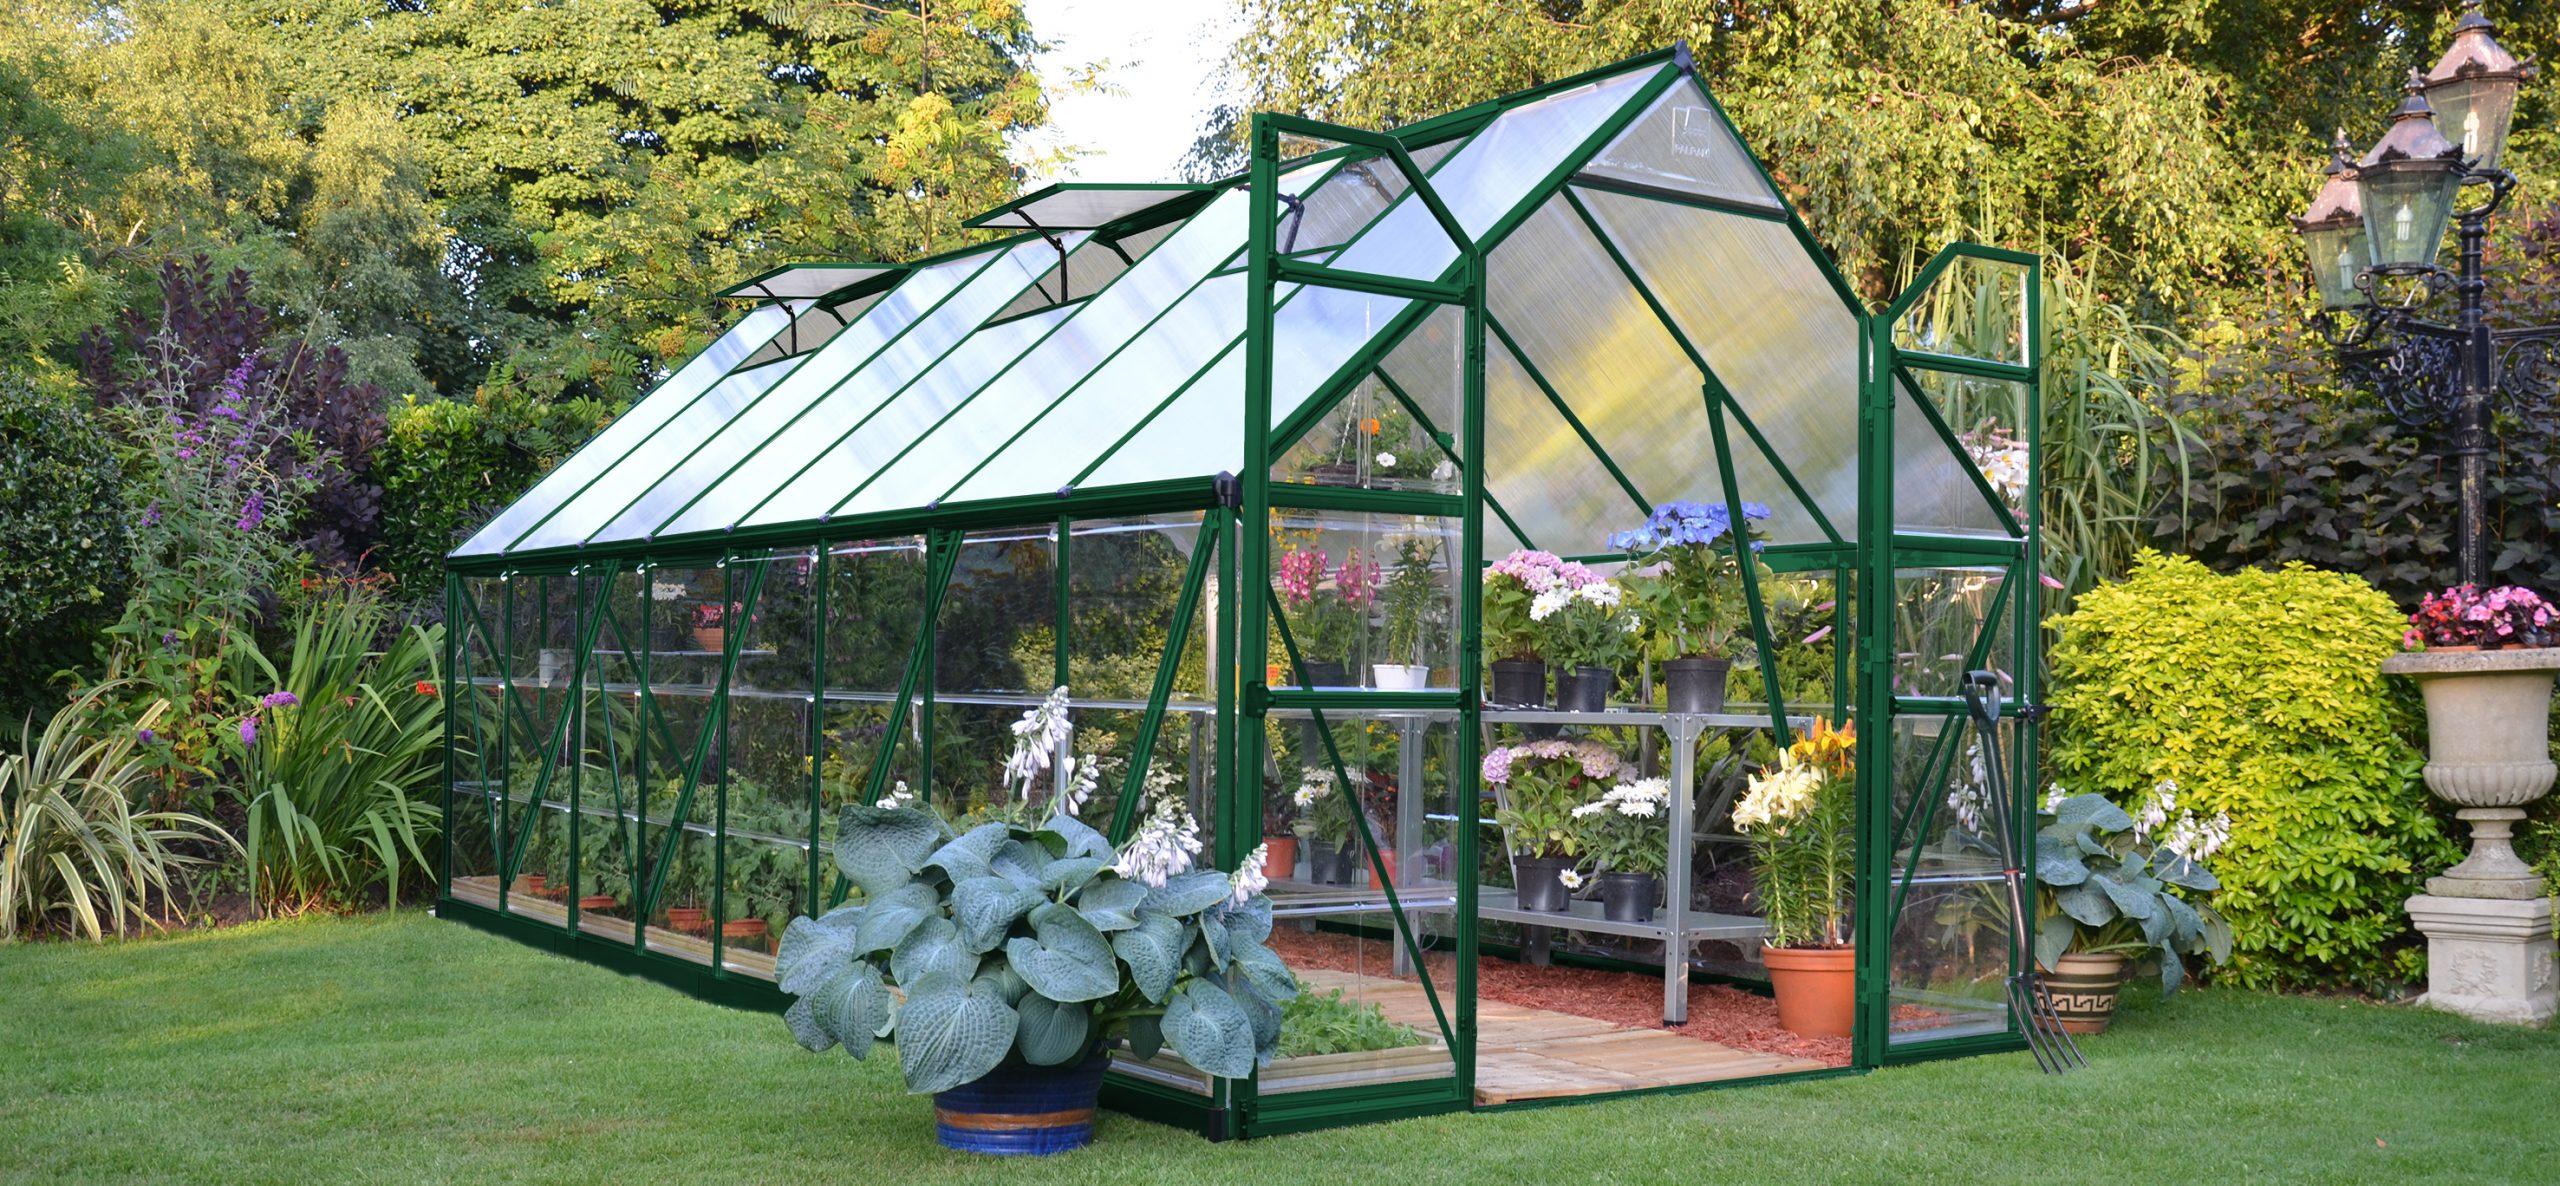 Serre De Jardin ⇒ S, Comparatif & Meilleur Serres Pour 2020 avec Petite Serres De Jardin